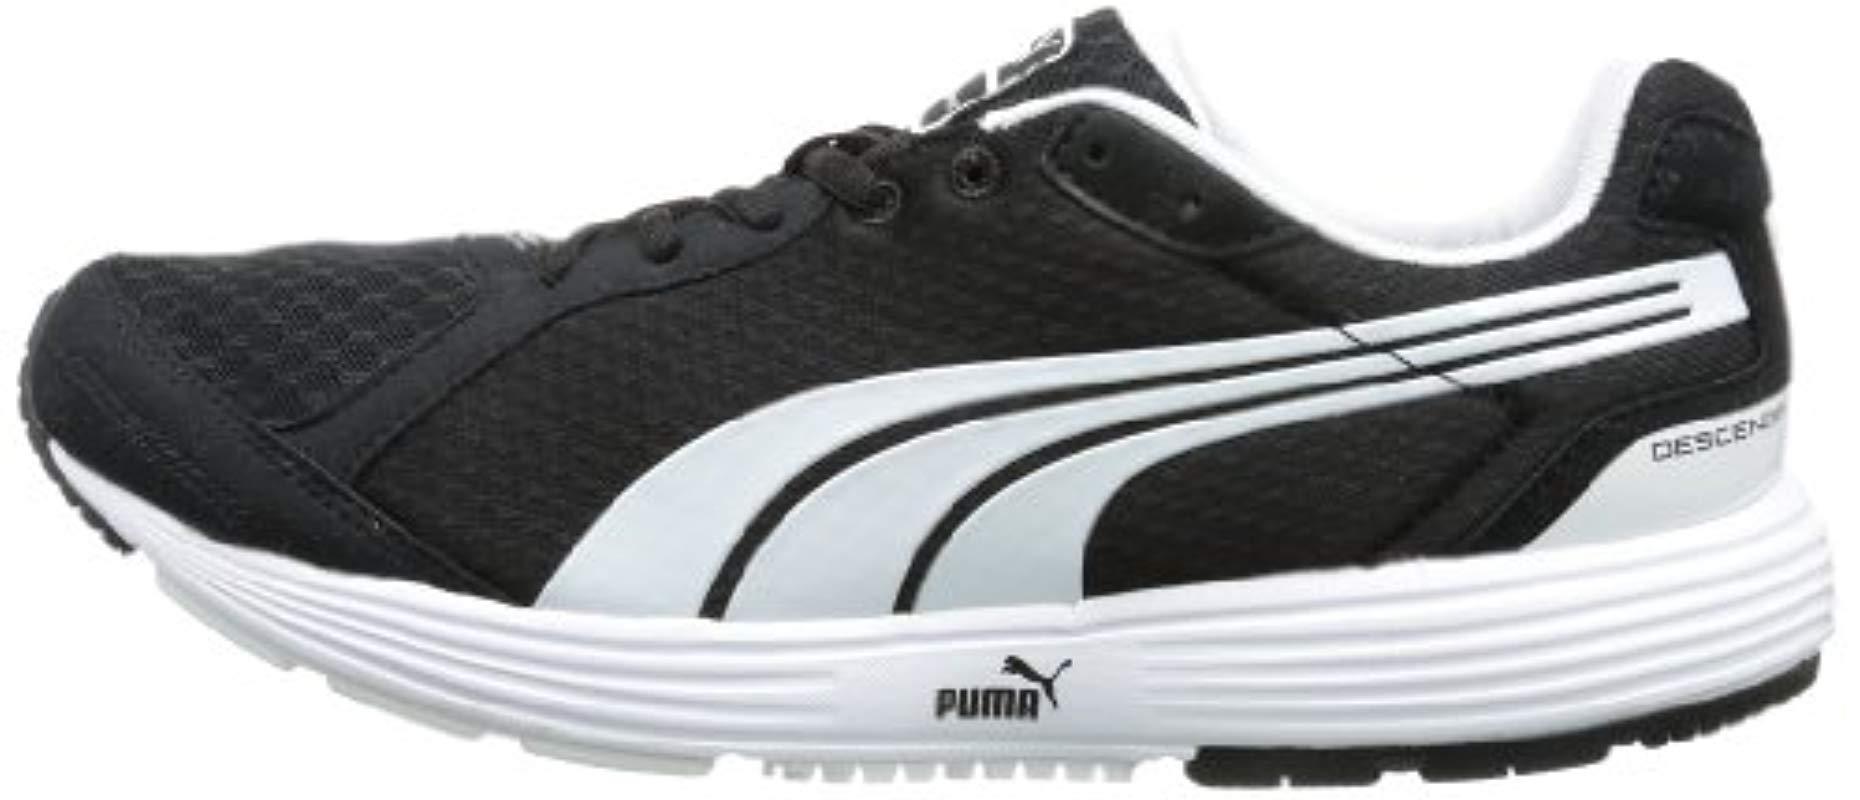 PUMA Descendant V1.5 Running Shoes in